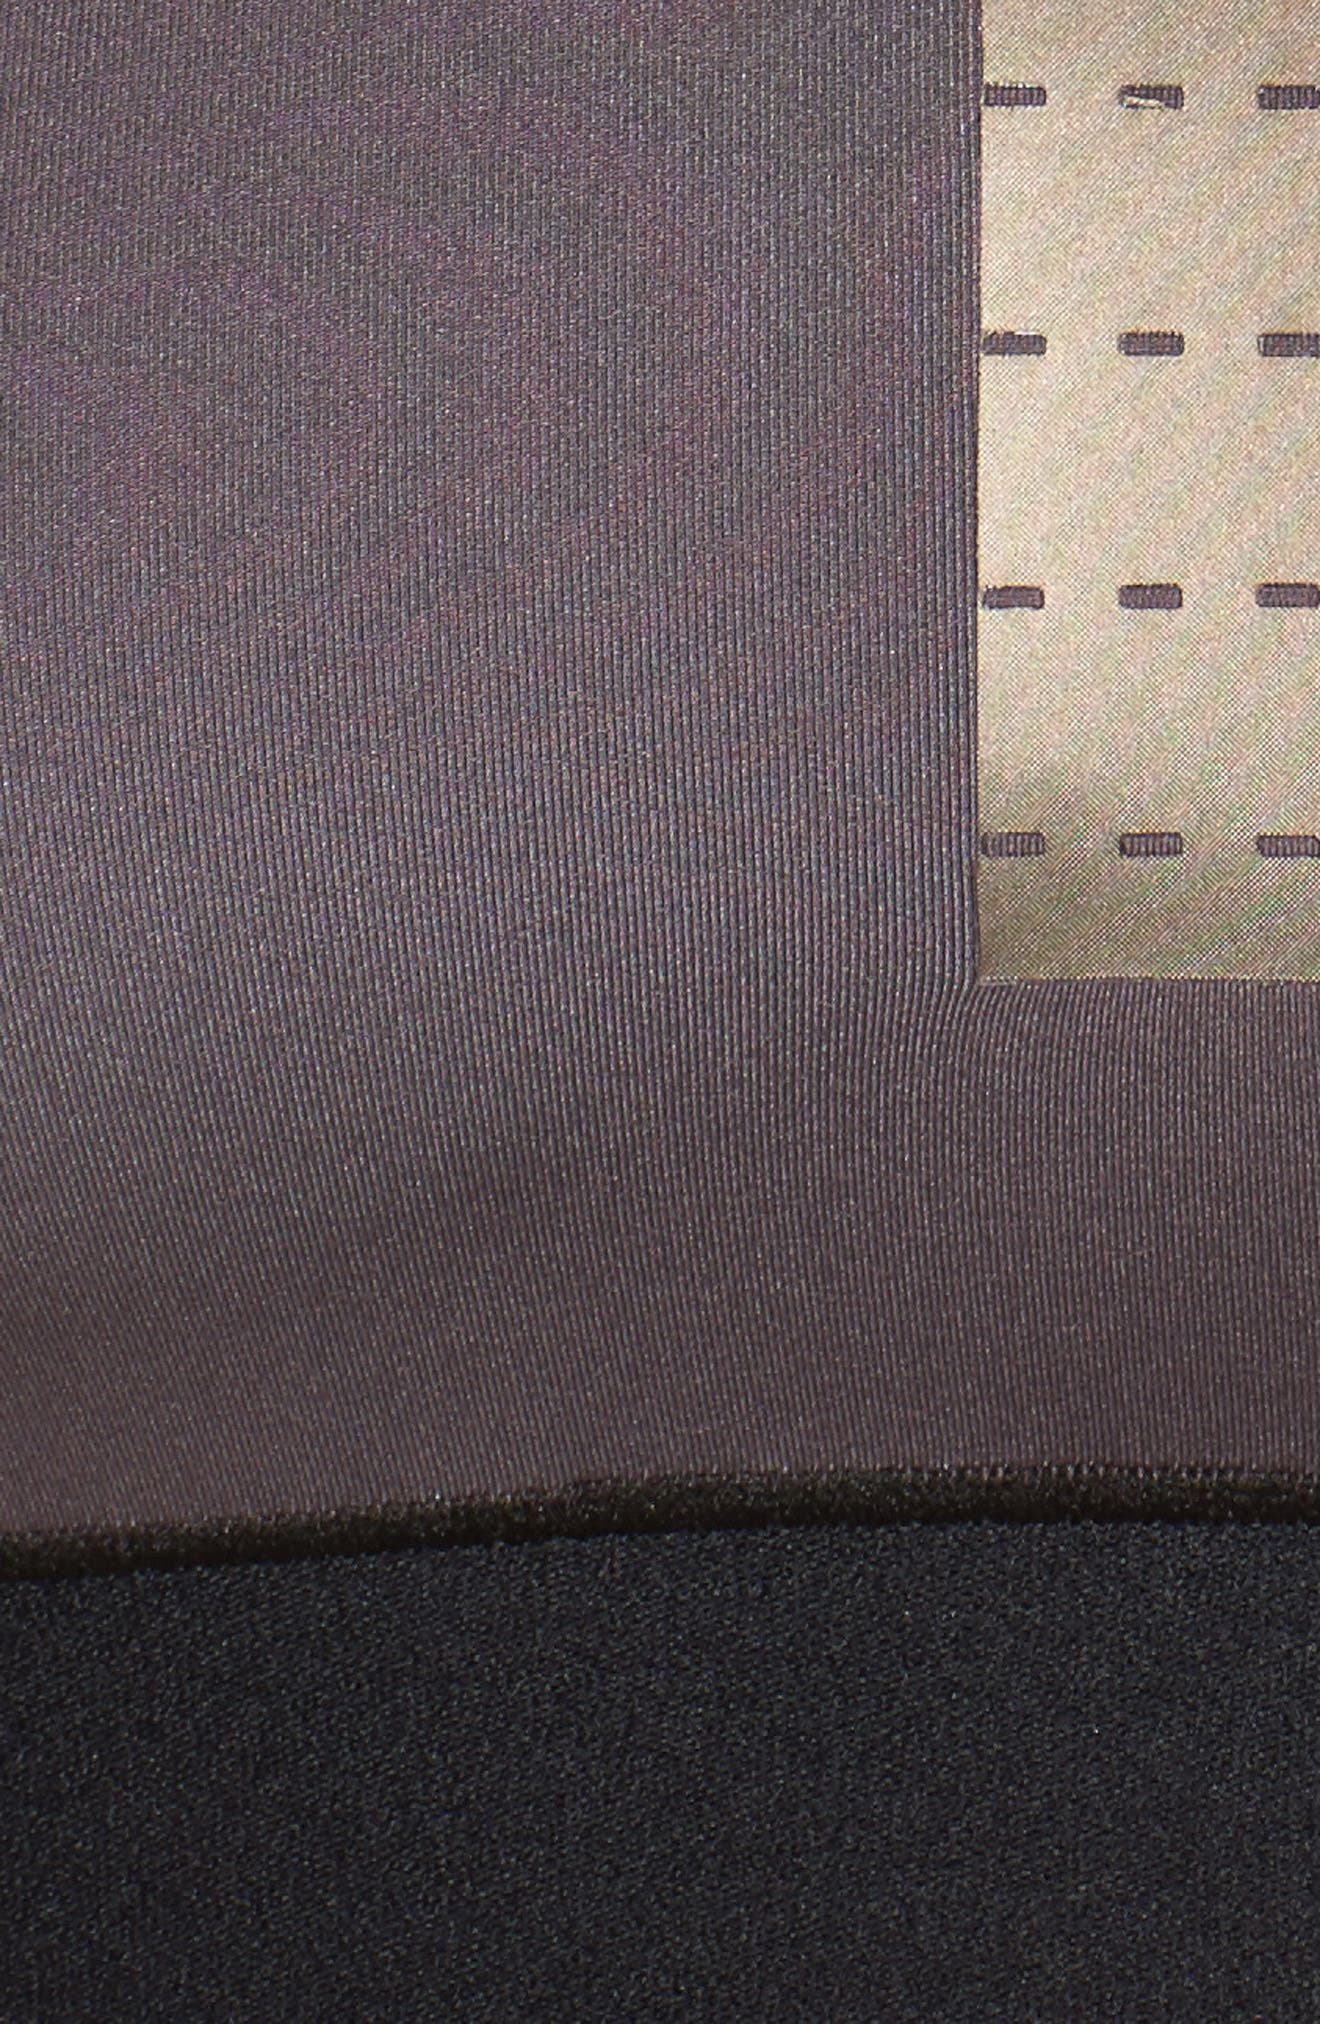 Altitude Silk AK17 Crop Top,                             Alternate thumbnail 6, color,                             Taupe/ Taupe Satin